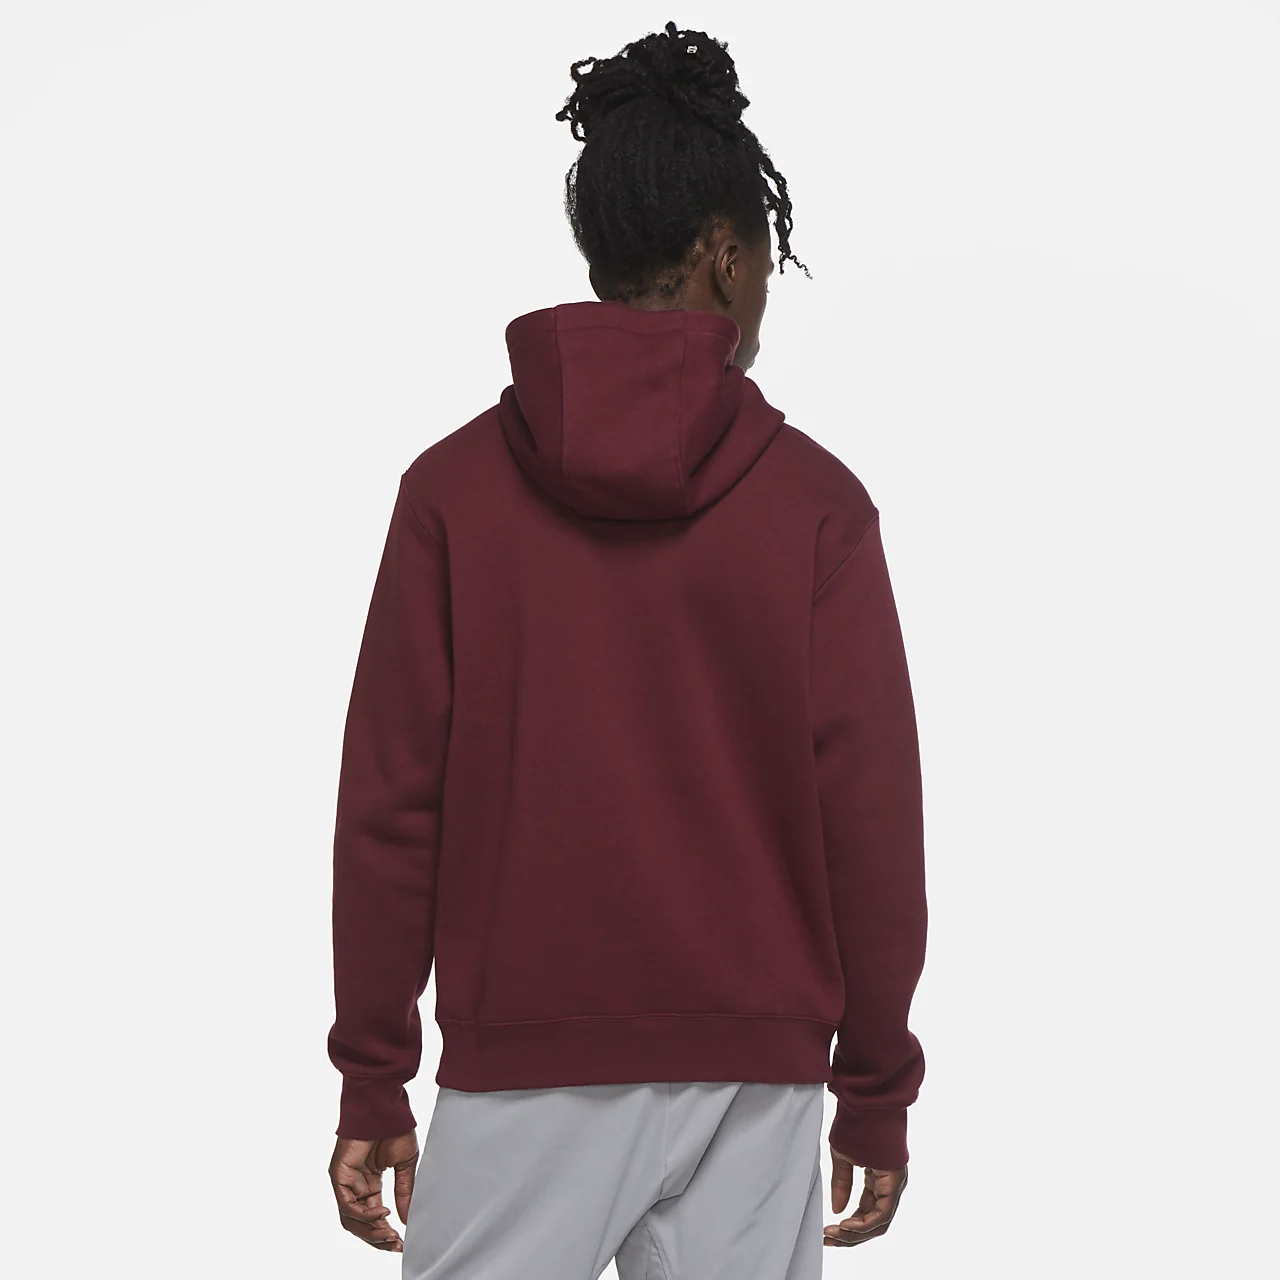 Nike Sportswear Men's Pullover Hoodie CU4373-638